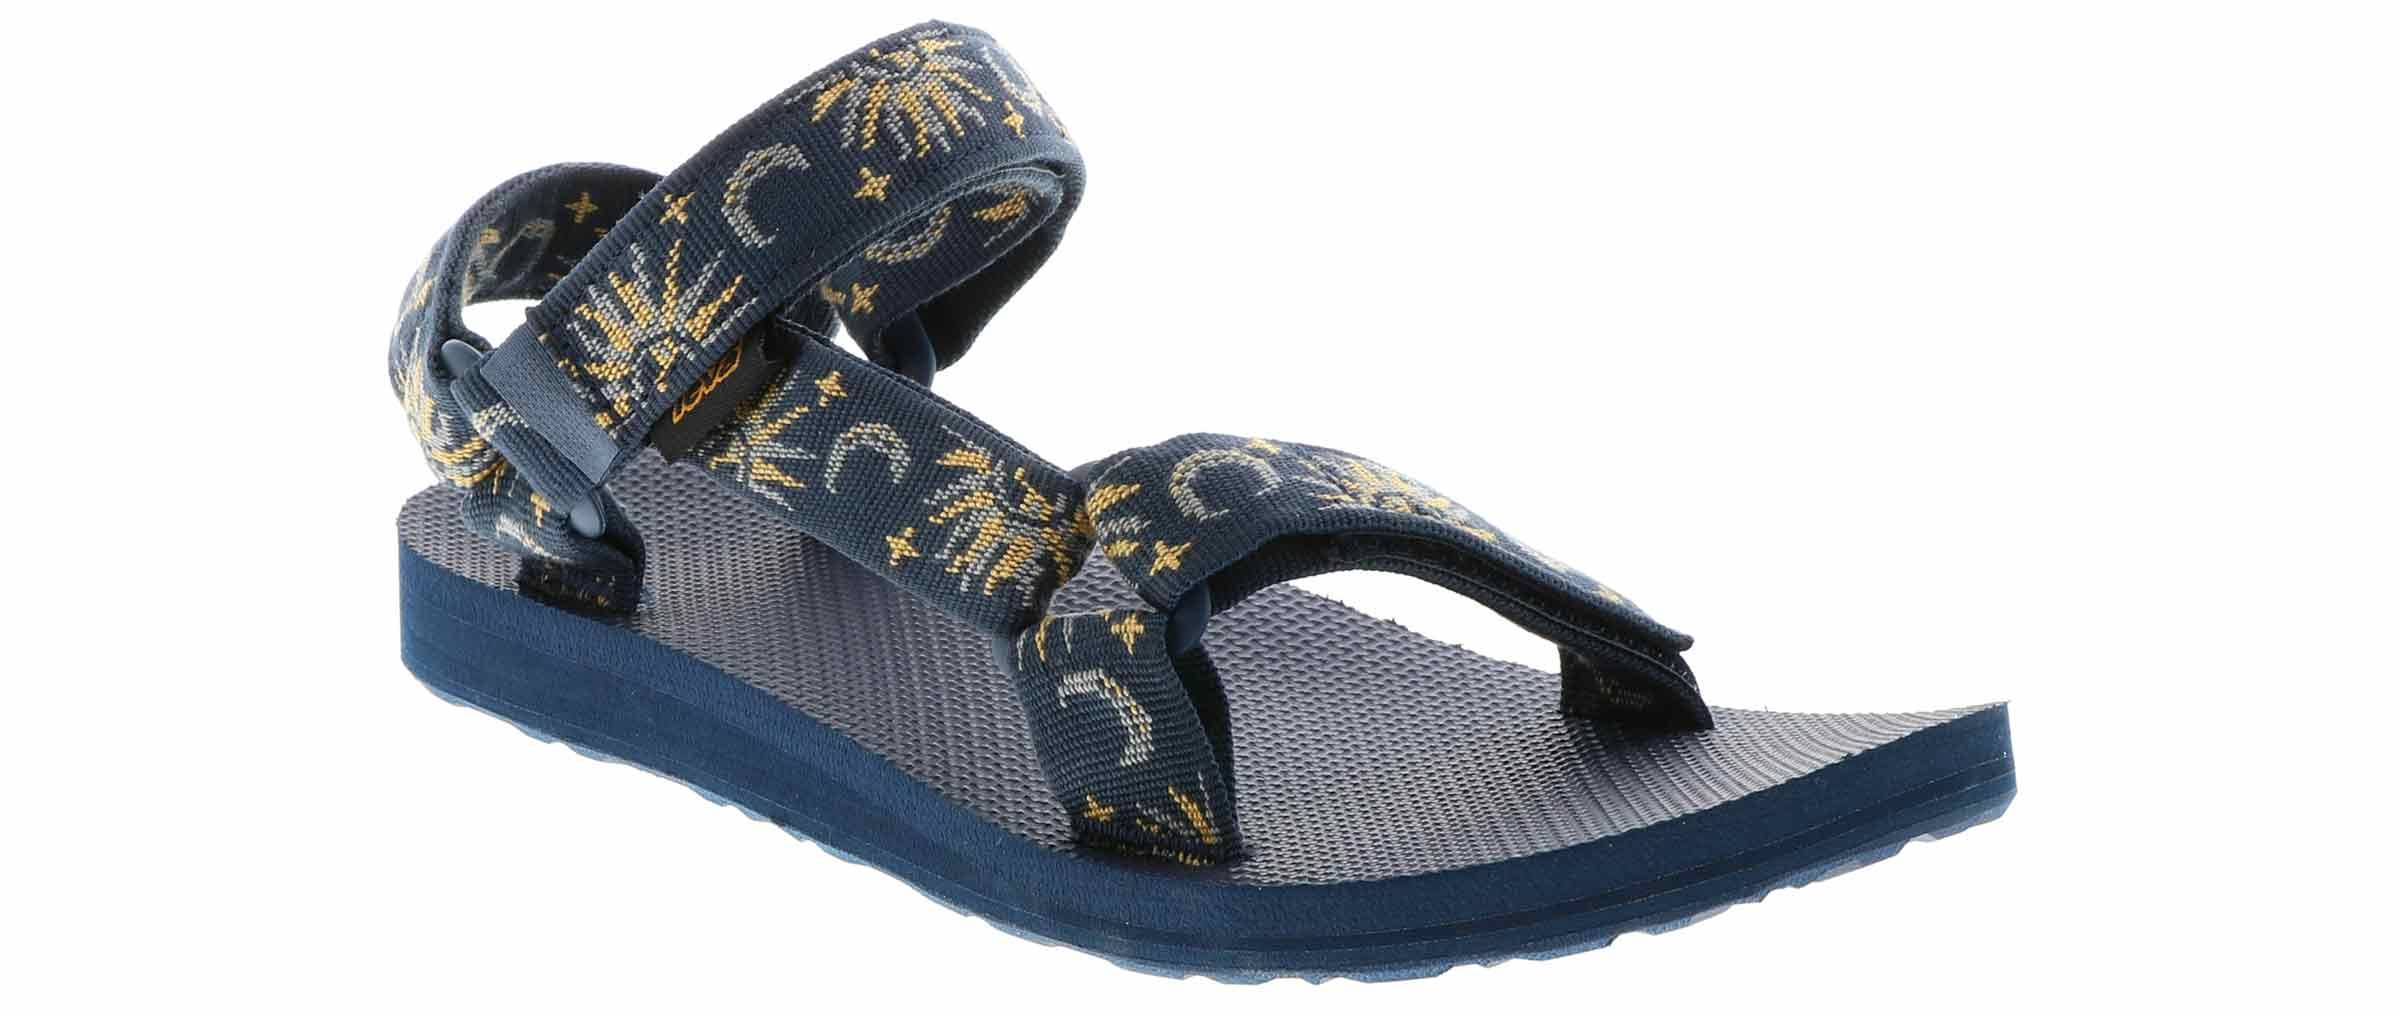 Teva Original Sun And Moon Women's Outdoor Sandal